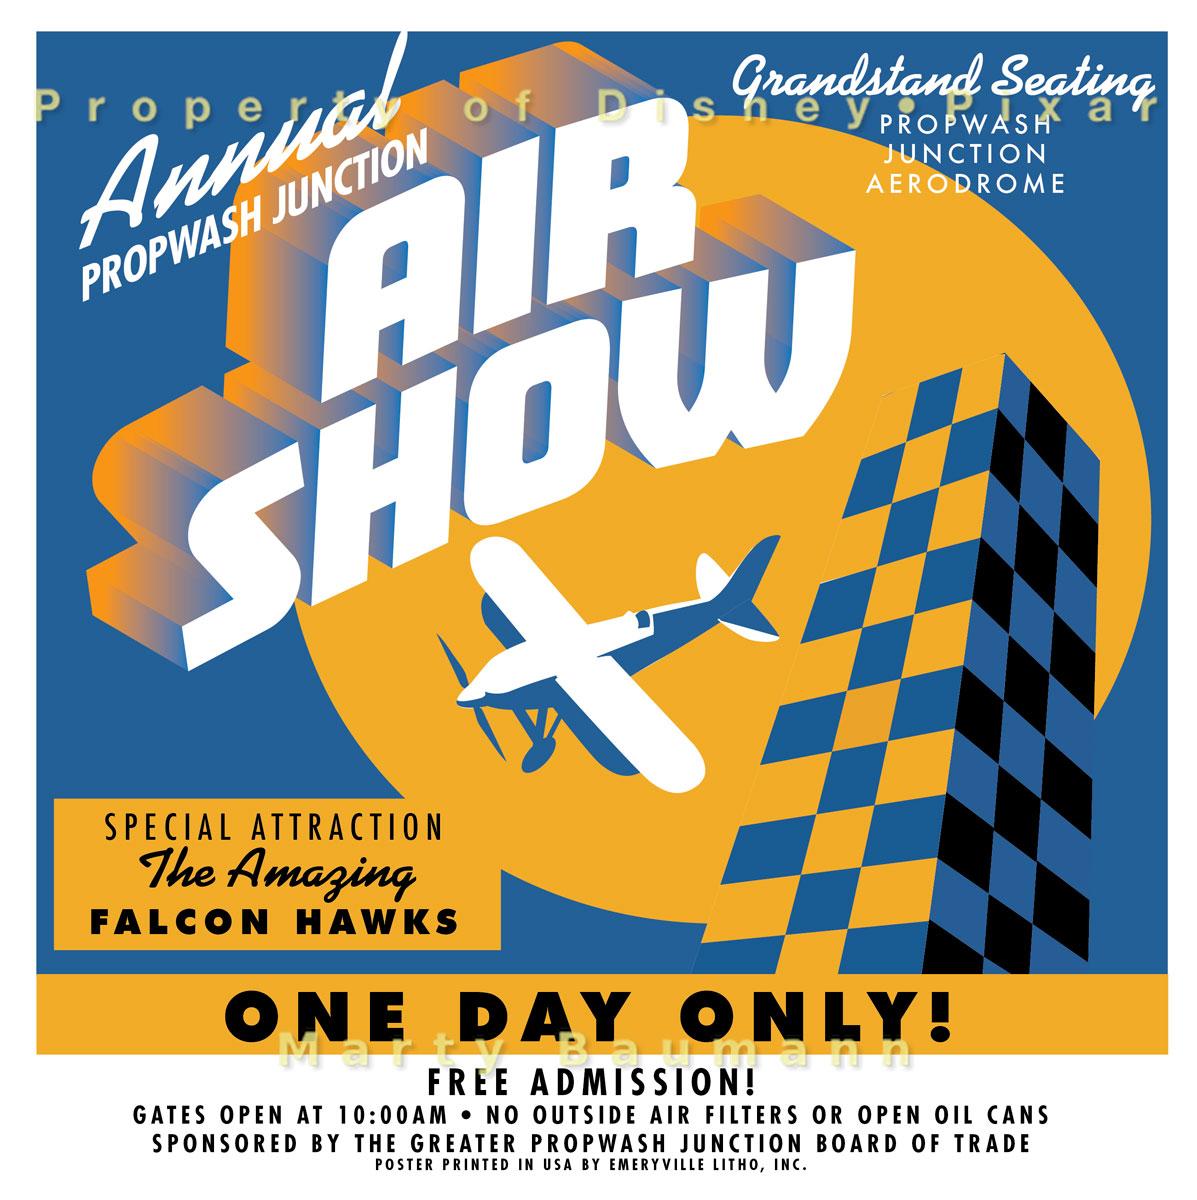 Pixar - Propwash Junction Air Show